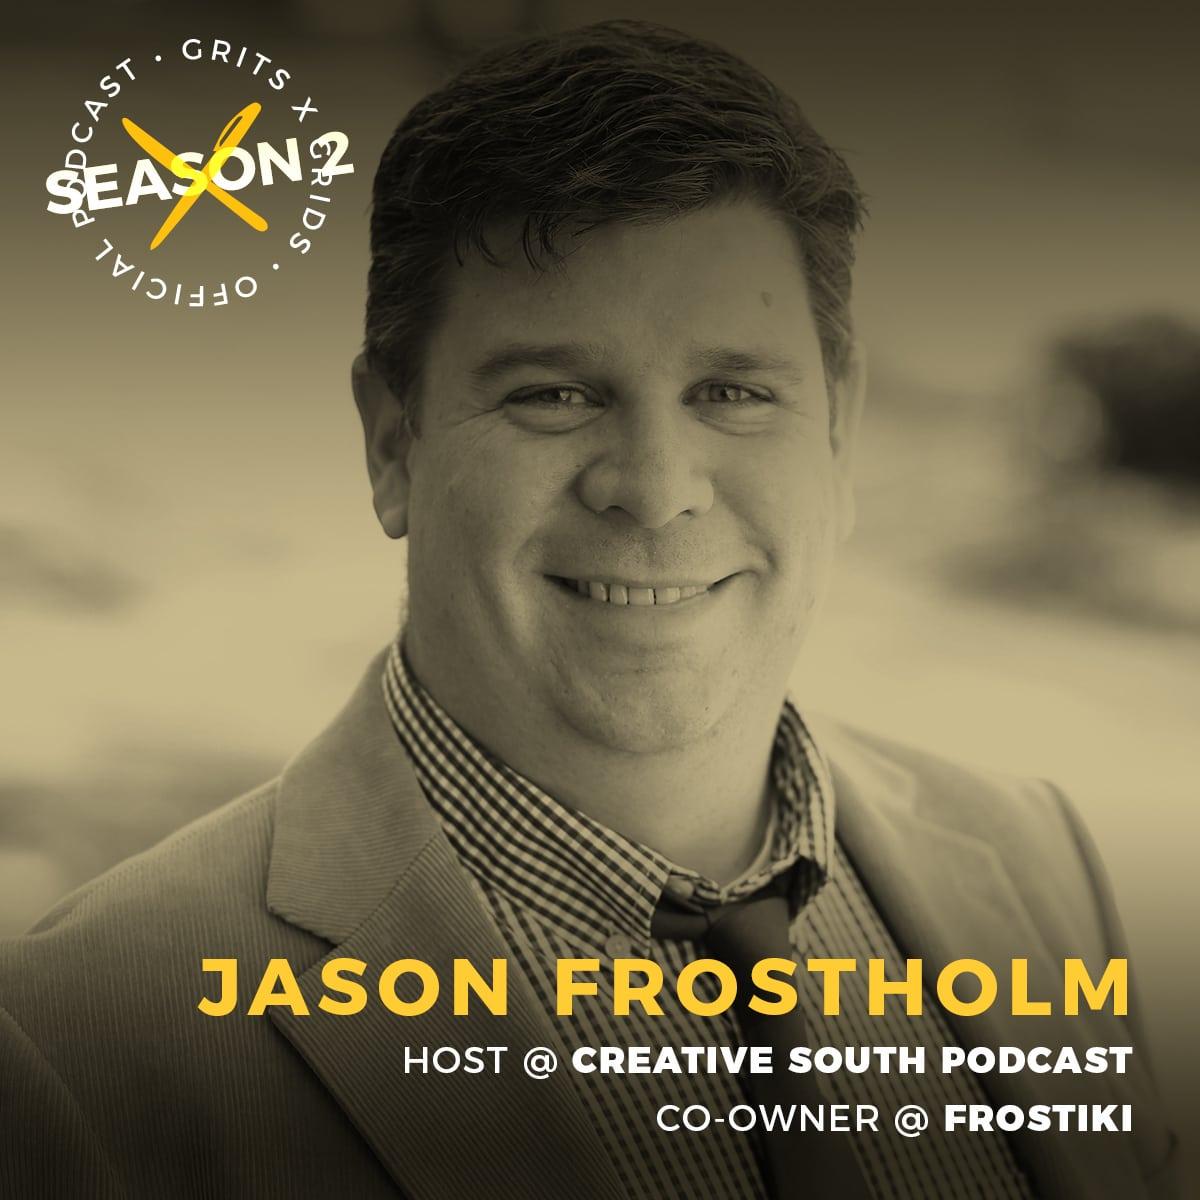 Season 2 / Episode 9: Jason Frostholm - Grits & Grids®